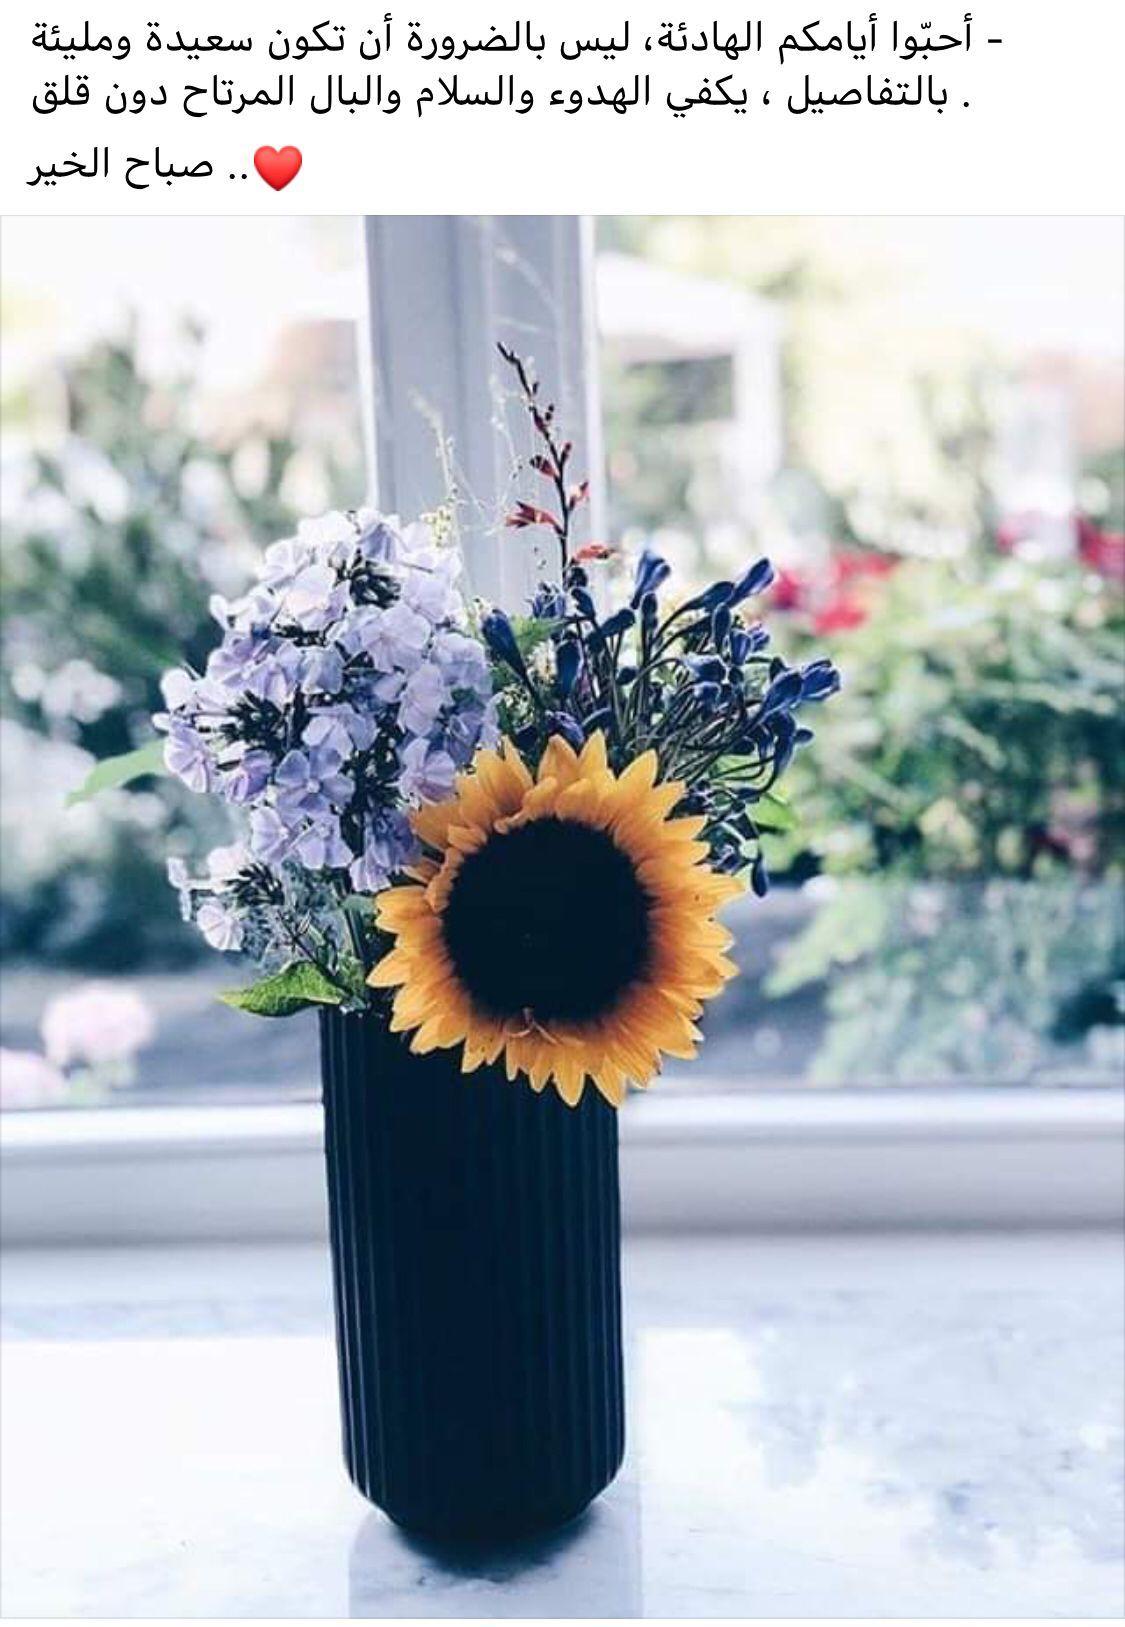 صور صباح الخير Flowers Beautiful Bouquet Beautiful Lights